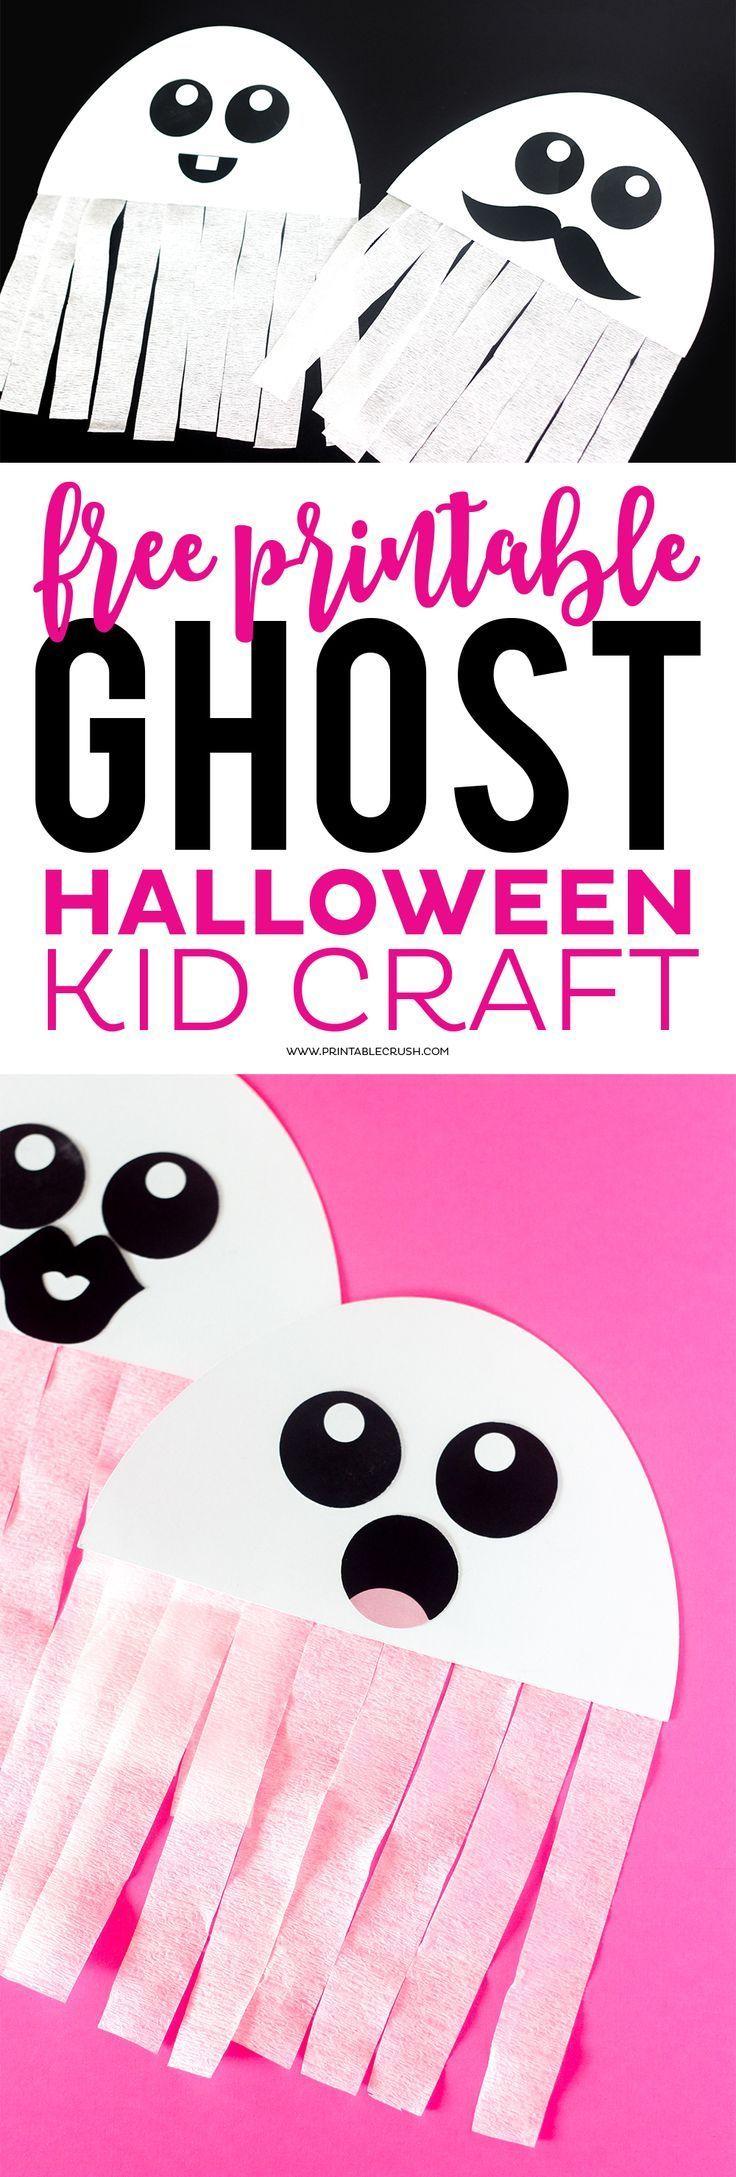 15++ Halloween crafts for kids free printable information